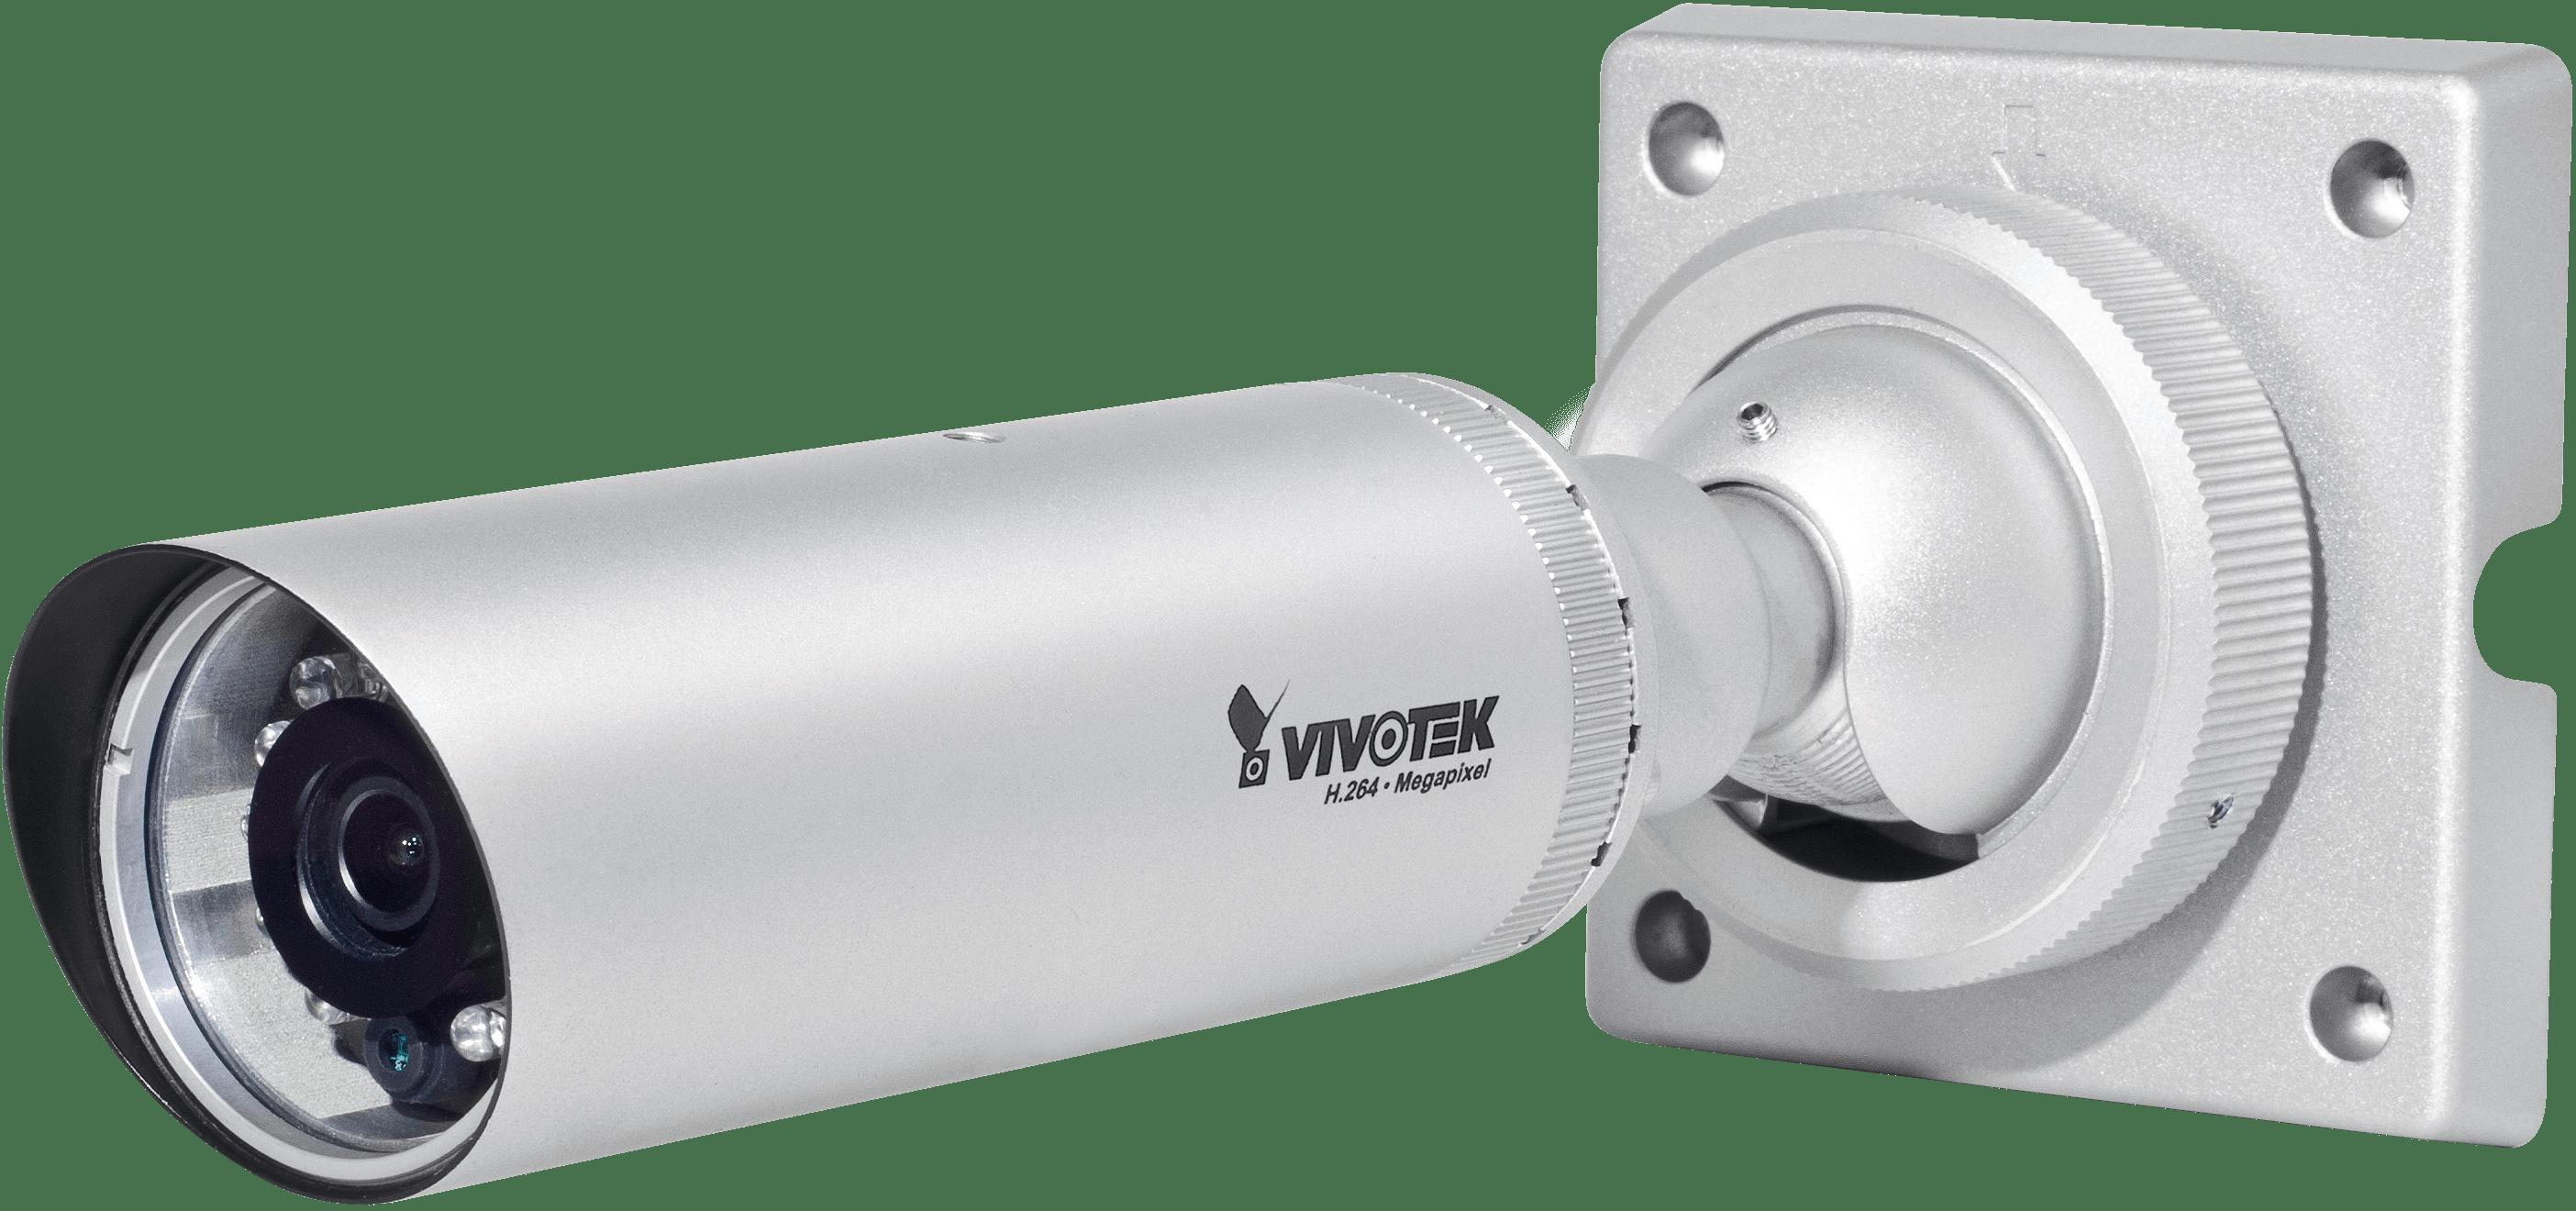 Ip8332 C Vivotek Network Bullet Camera Vivotek